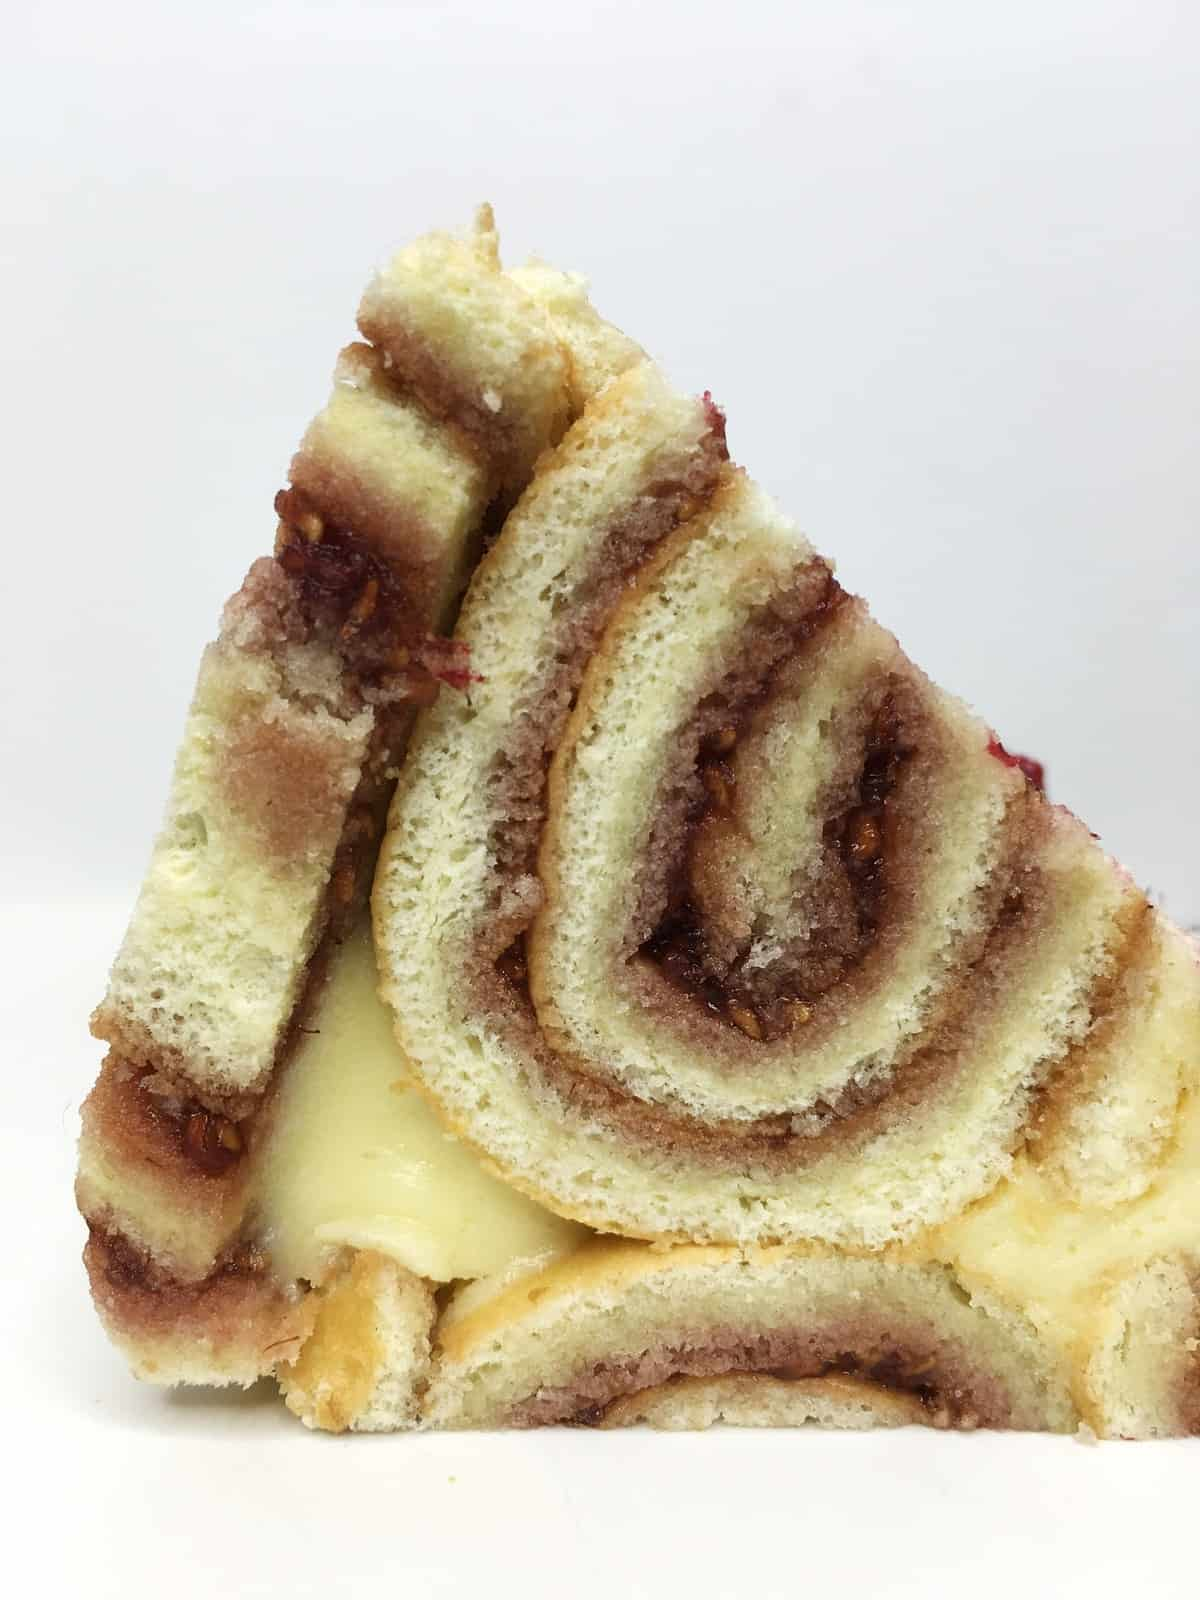 A single slice of Charlotte cake: Bottom view